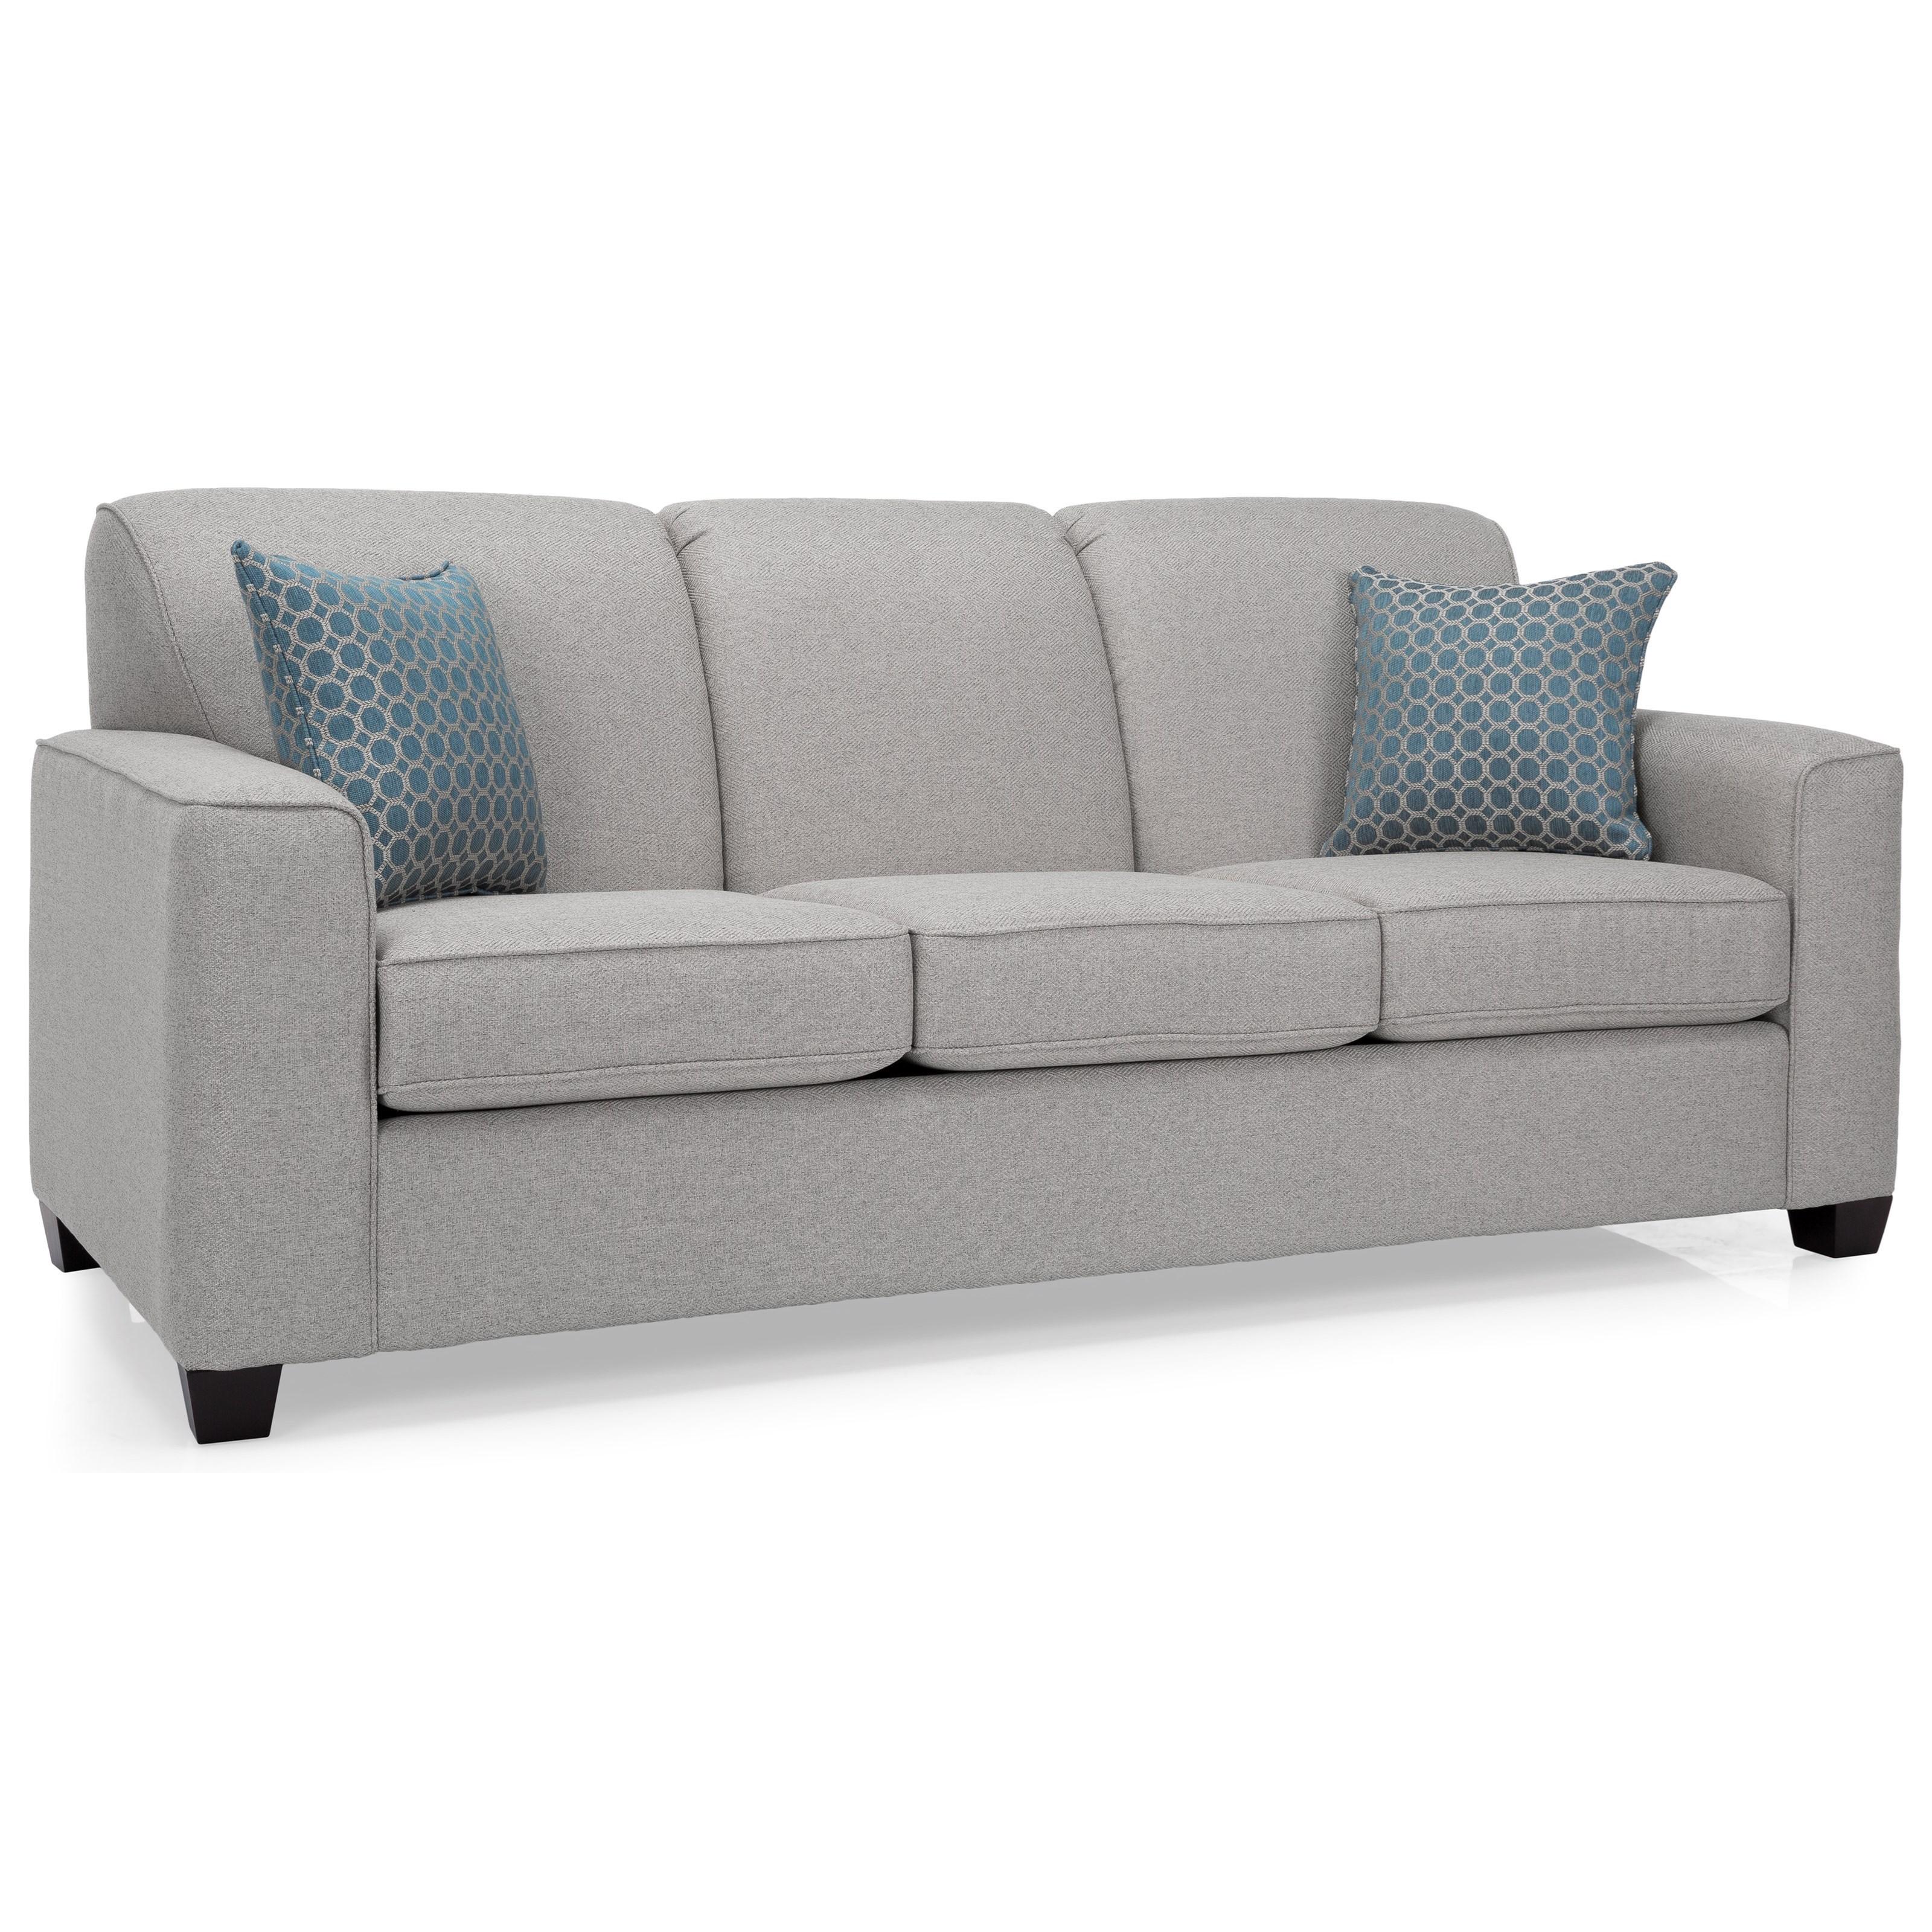 2705 Sofa by Decor-Rest at Johnny Janosik